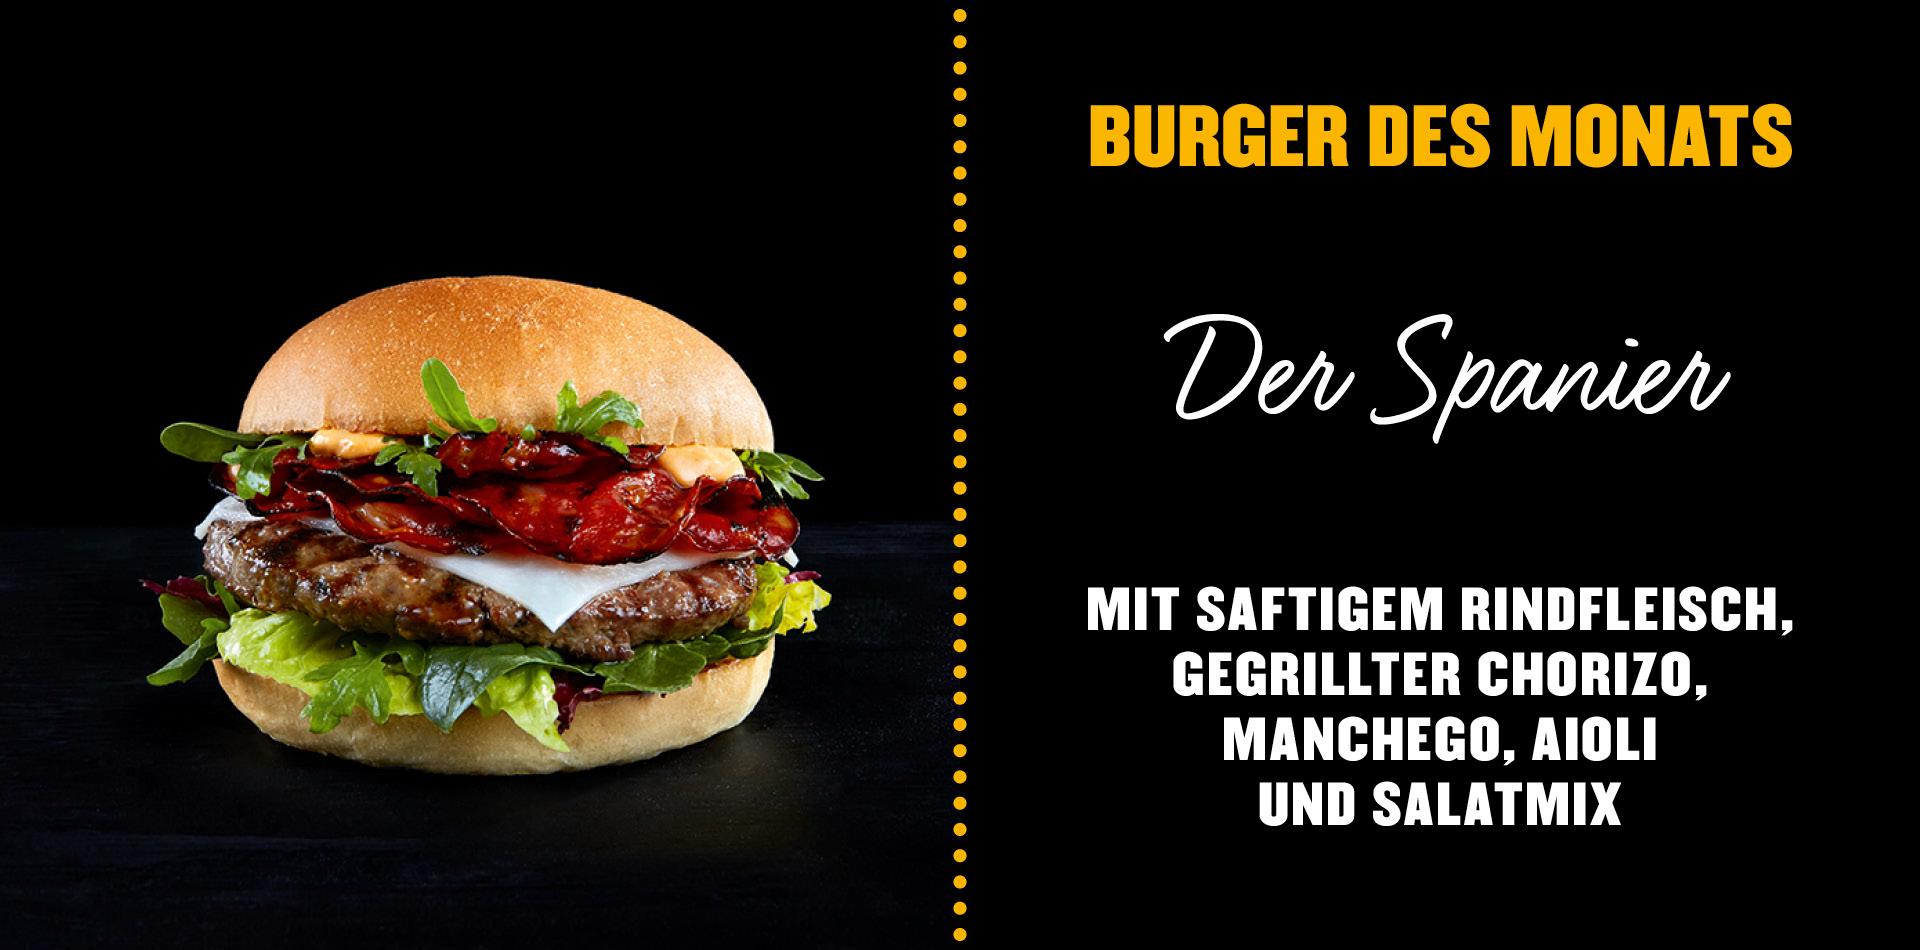 Burger des Monats Hamburgerei - Der Spanier